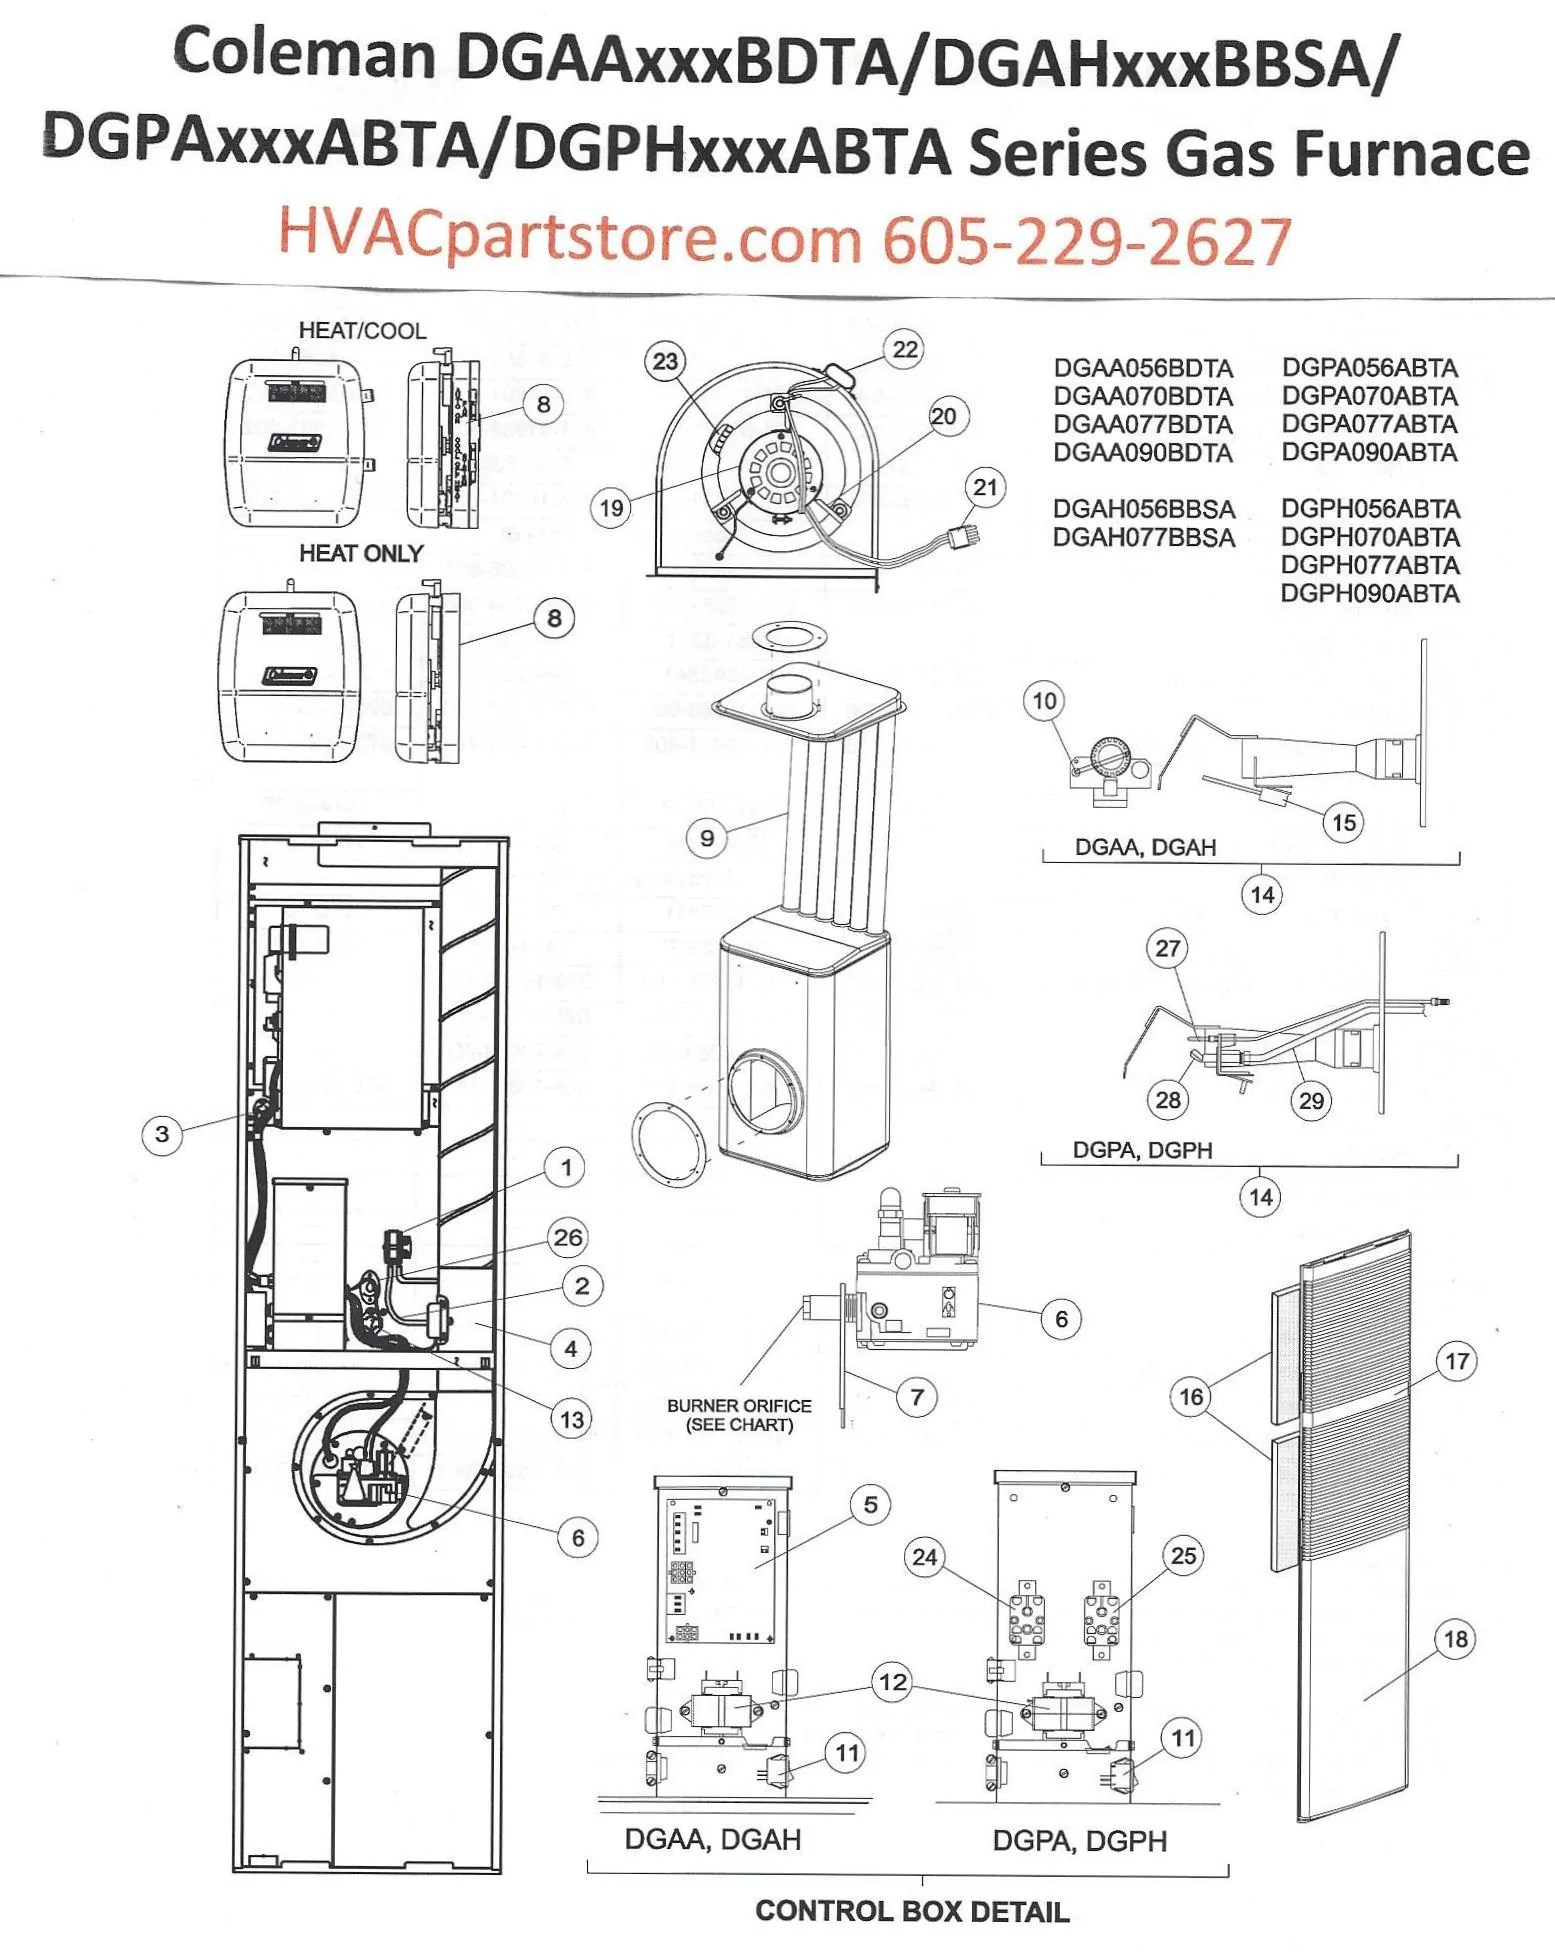 medium resolution of dgaa090bdta coleman gas furnace parts